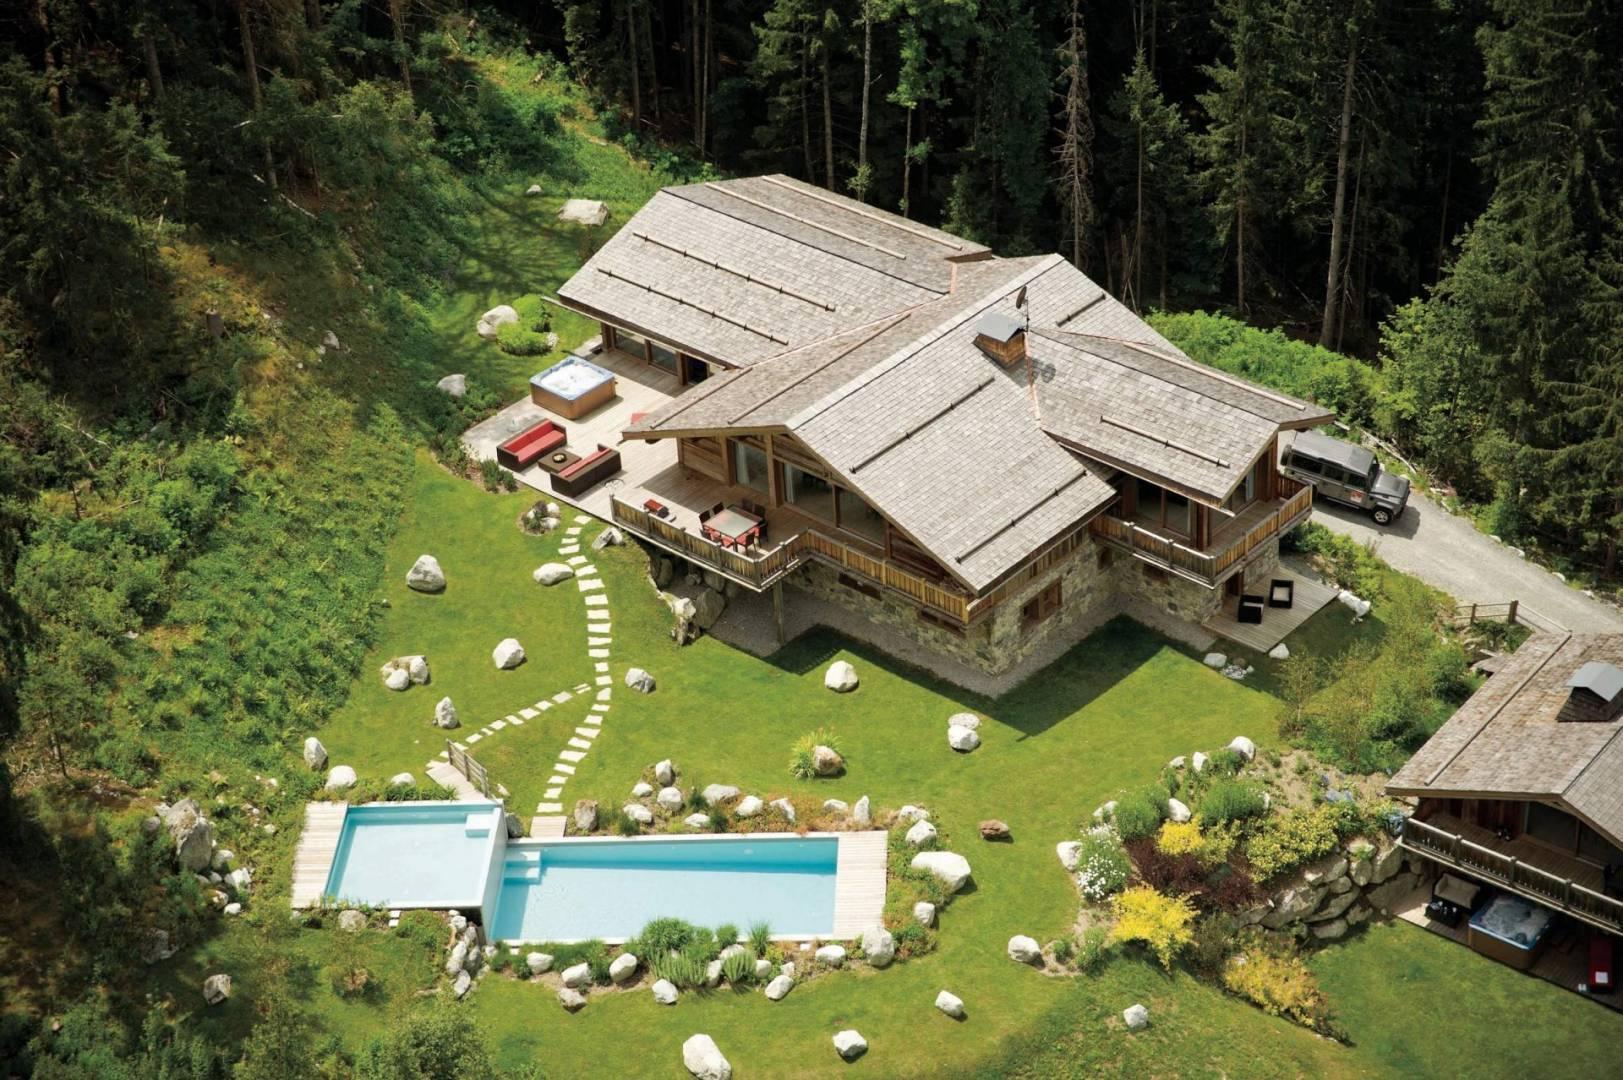 3 32 Chamonix-Mont-Blanc